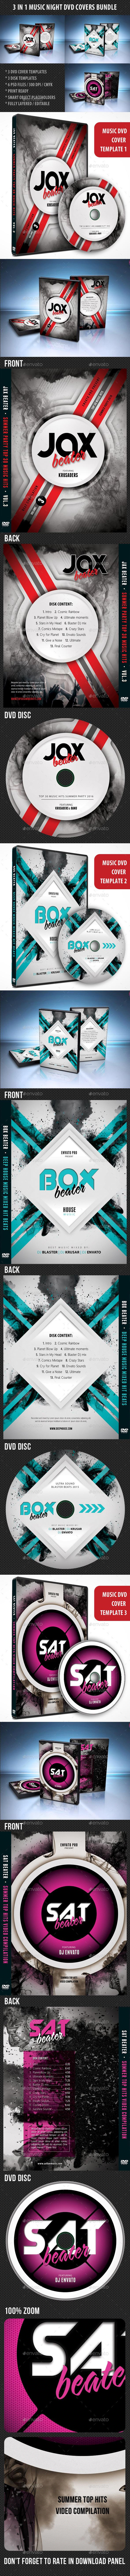 3 in 1 Music DVD Covers Bundle 05 - CD & DVD Artwork Print Templates